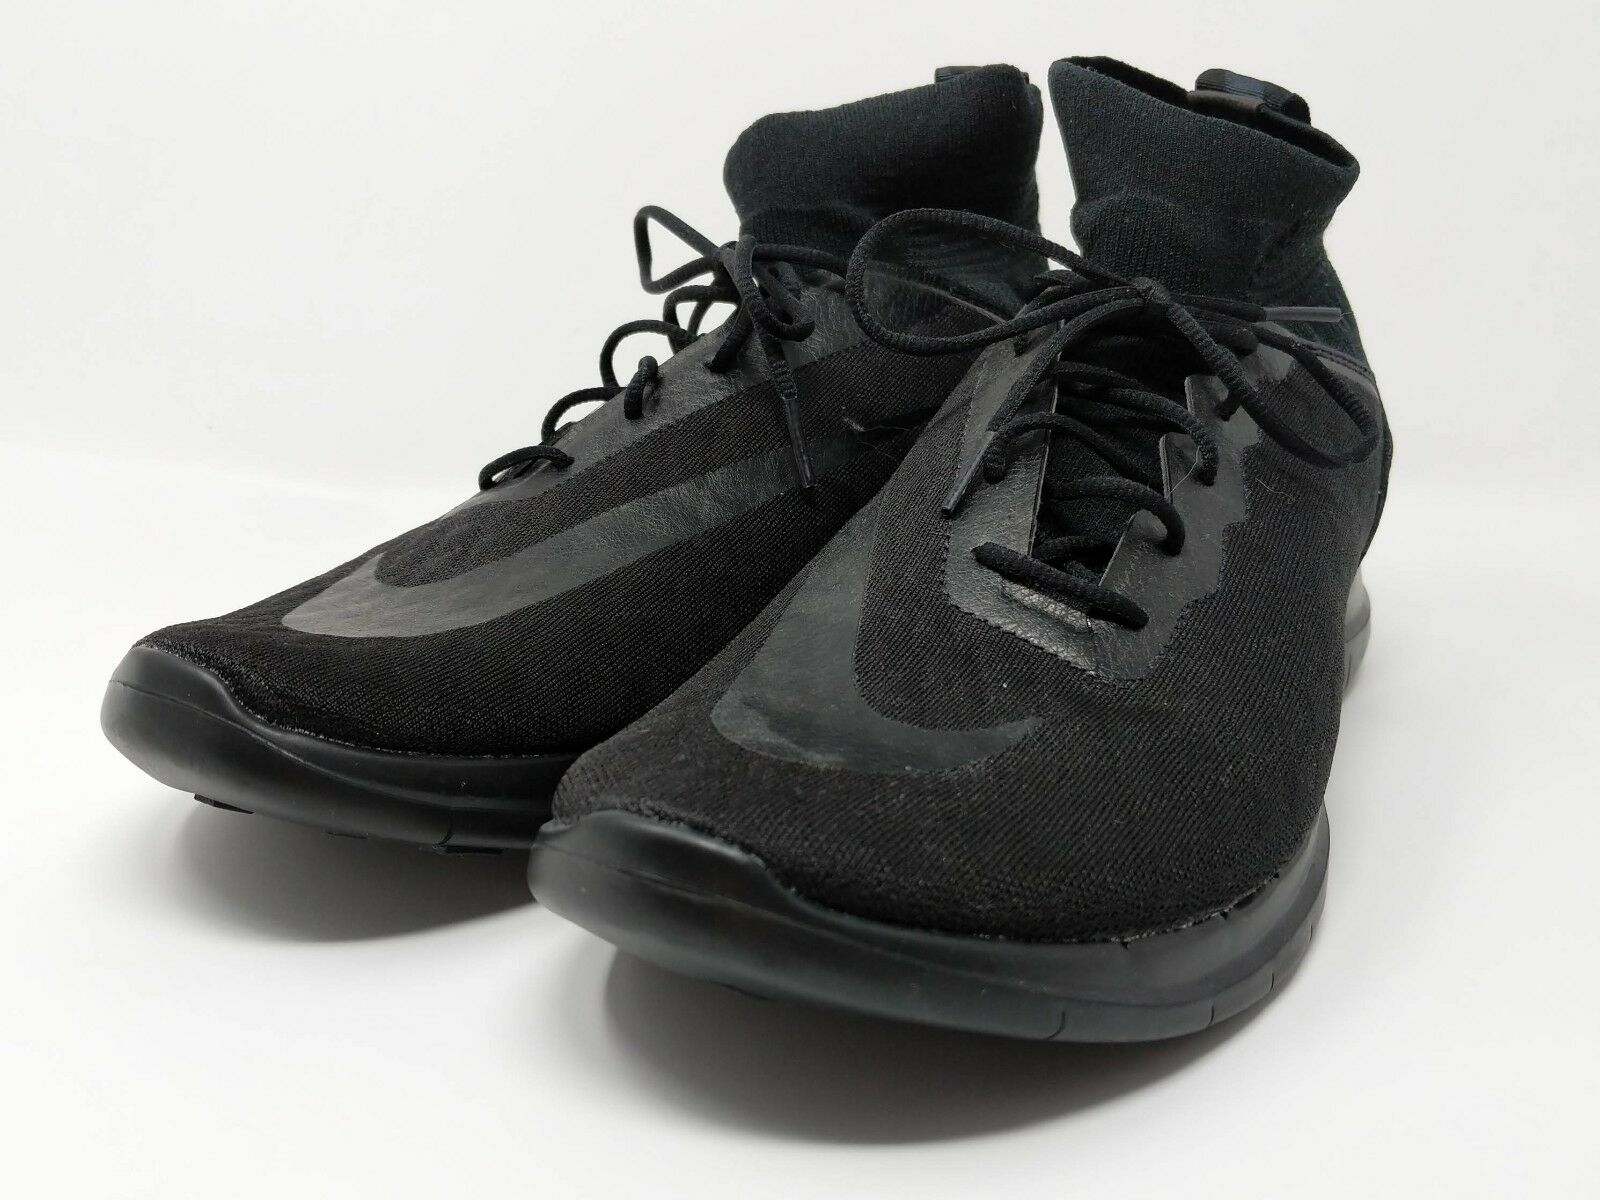 The latest discount shoes for men and women New Nike Free 4.0 Hypervenom 3 FK FC Men US Sz 10.5 898030-004 Black Soccer